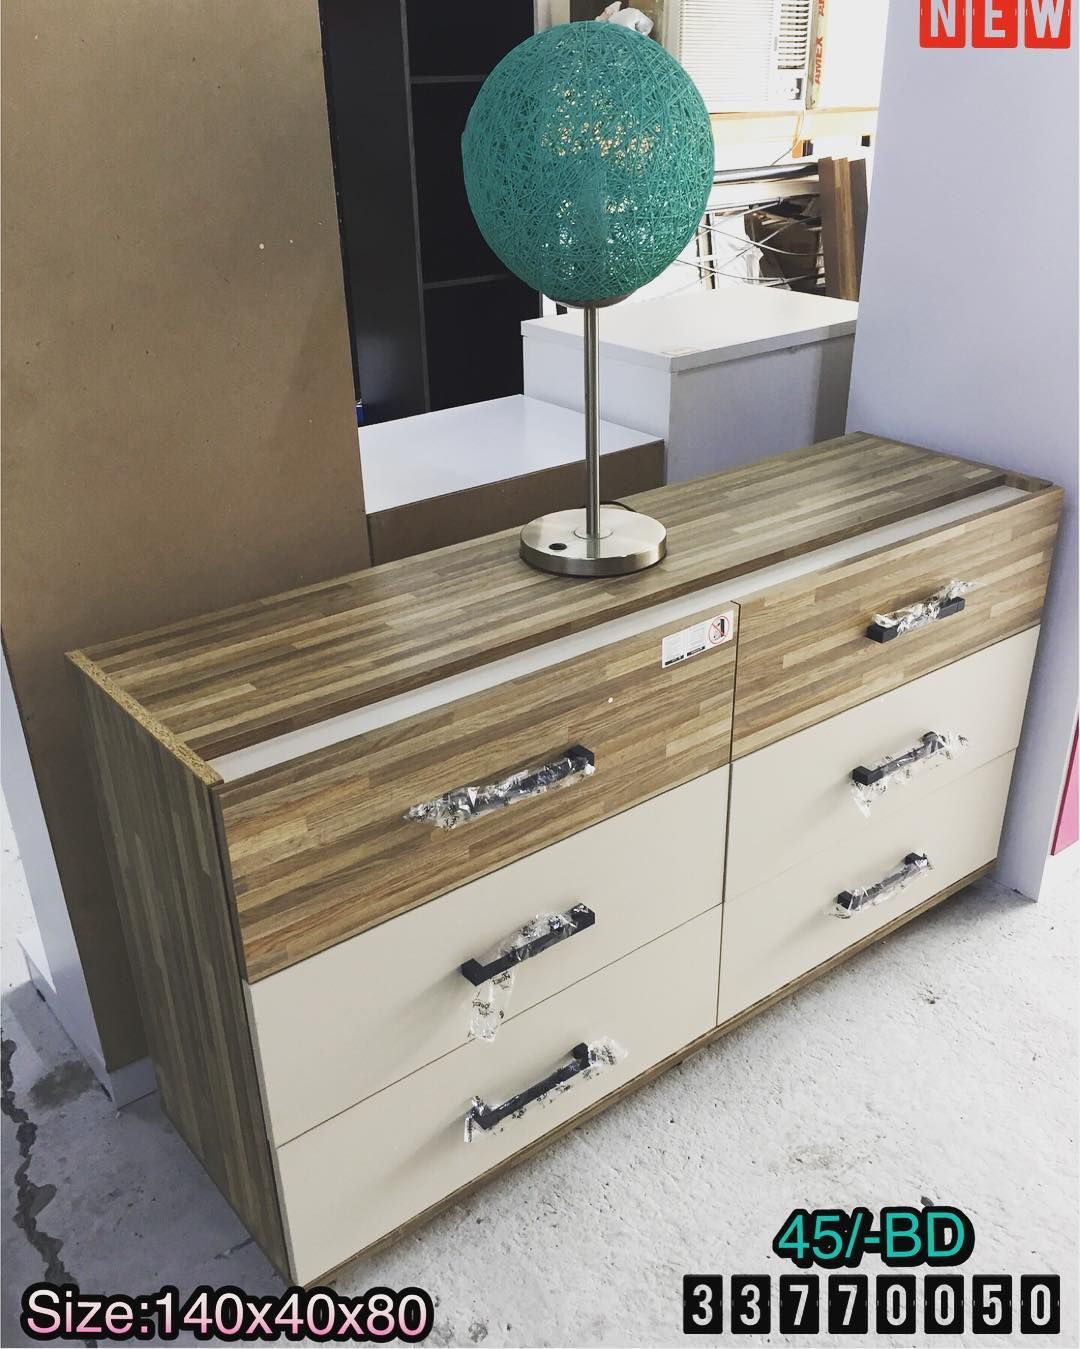 For Sale Wood Side Table Size 140x40x80 Brown Color New Price 45 Bd للبيع خزنة ادراج خشب لون بني جديد السعر 45 Vanity Home Decor Bathroom Vanity